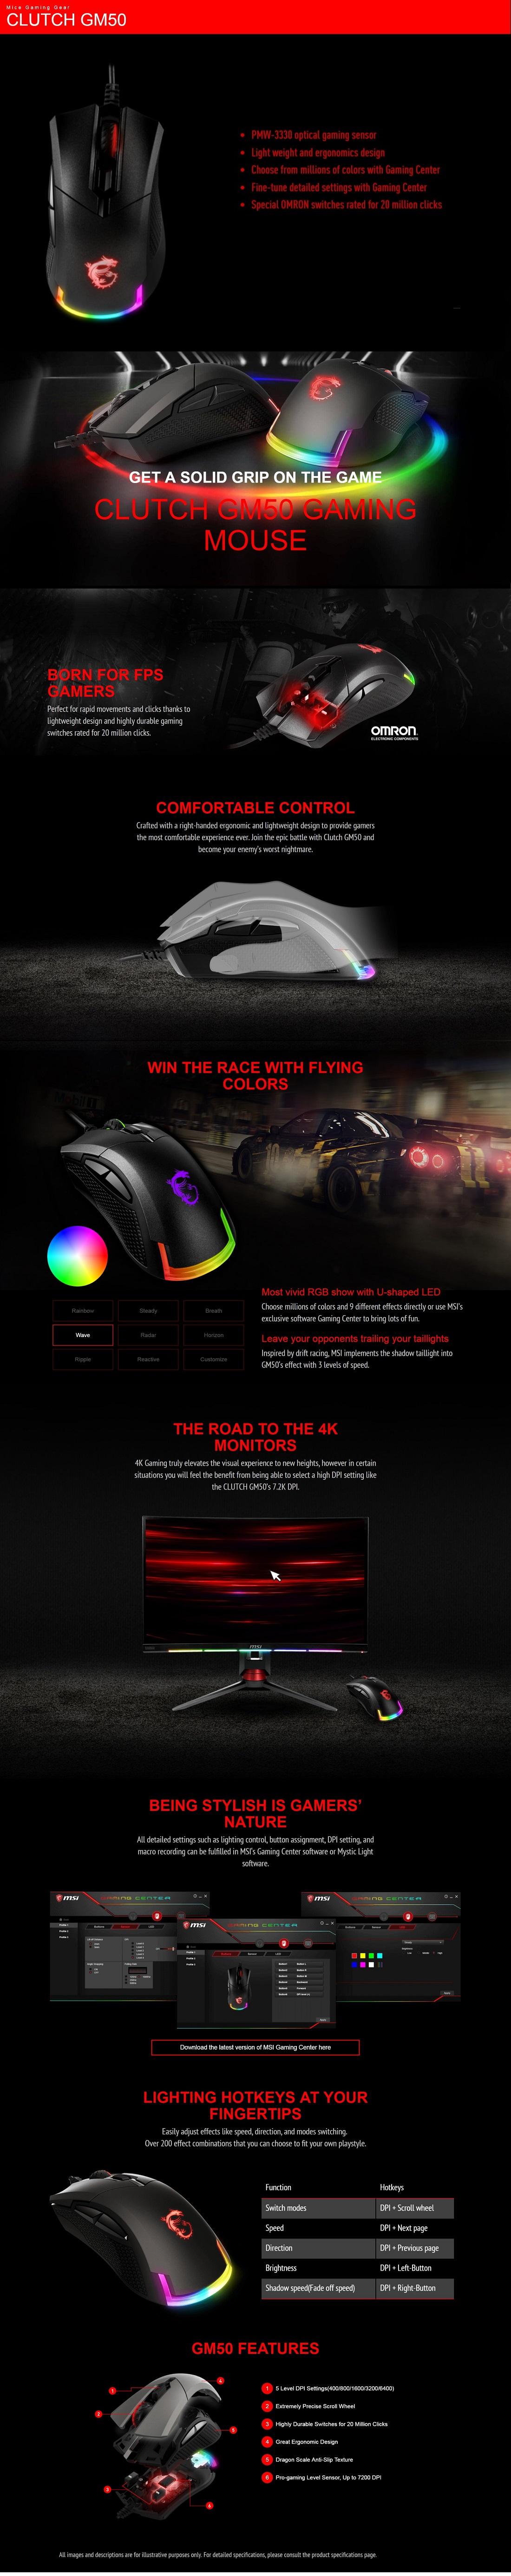 MSI Clutch GM50 Gaming Mouse Optical PMW-3330 Gaming Sensor 7200DPI Ergonomics